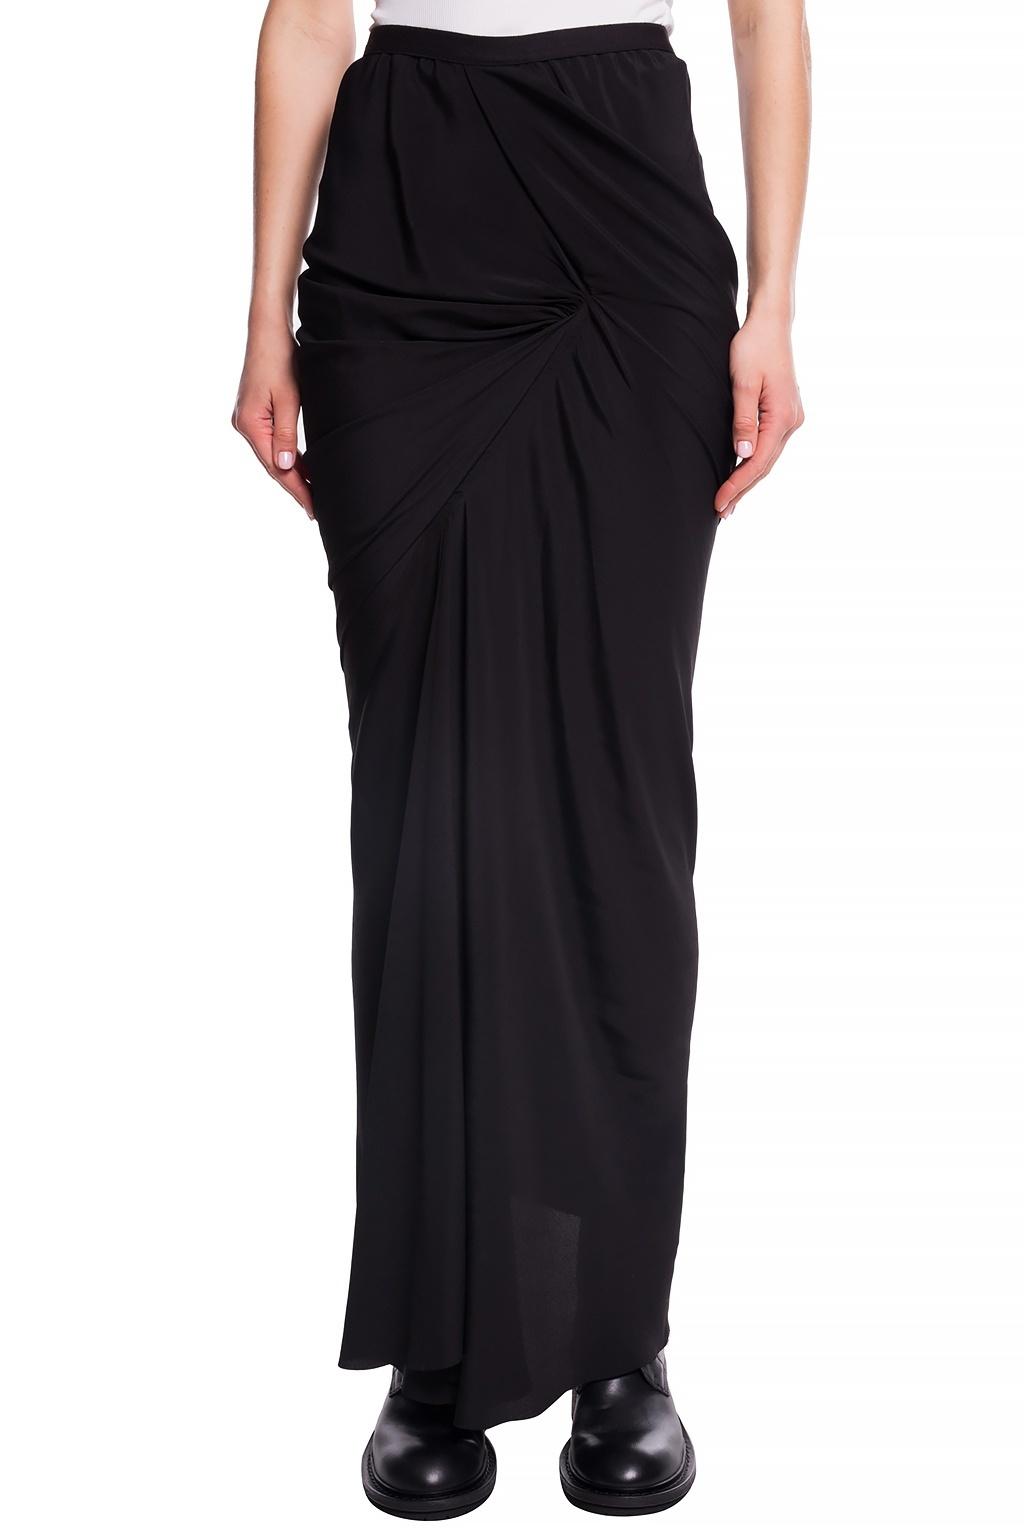 Skirt - Ruched - Black - Sz 40-1